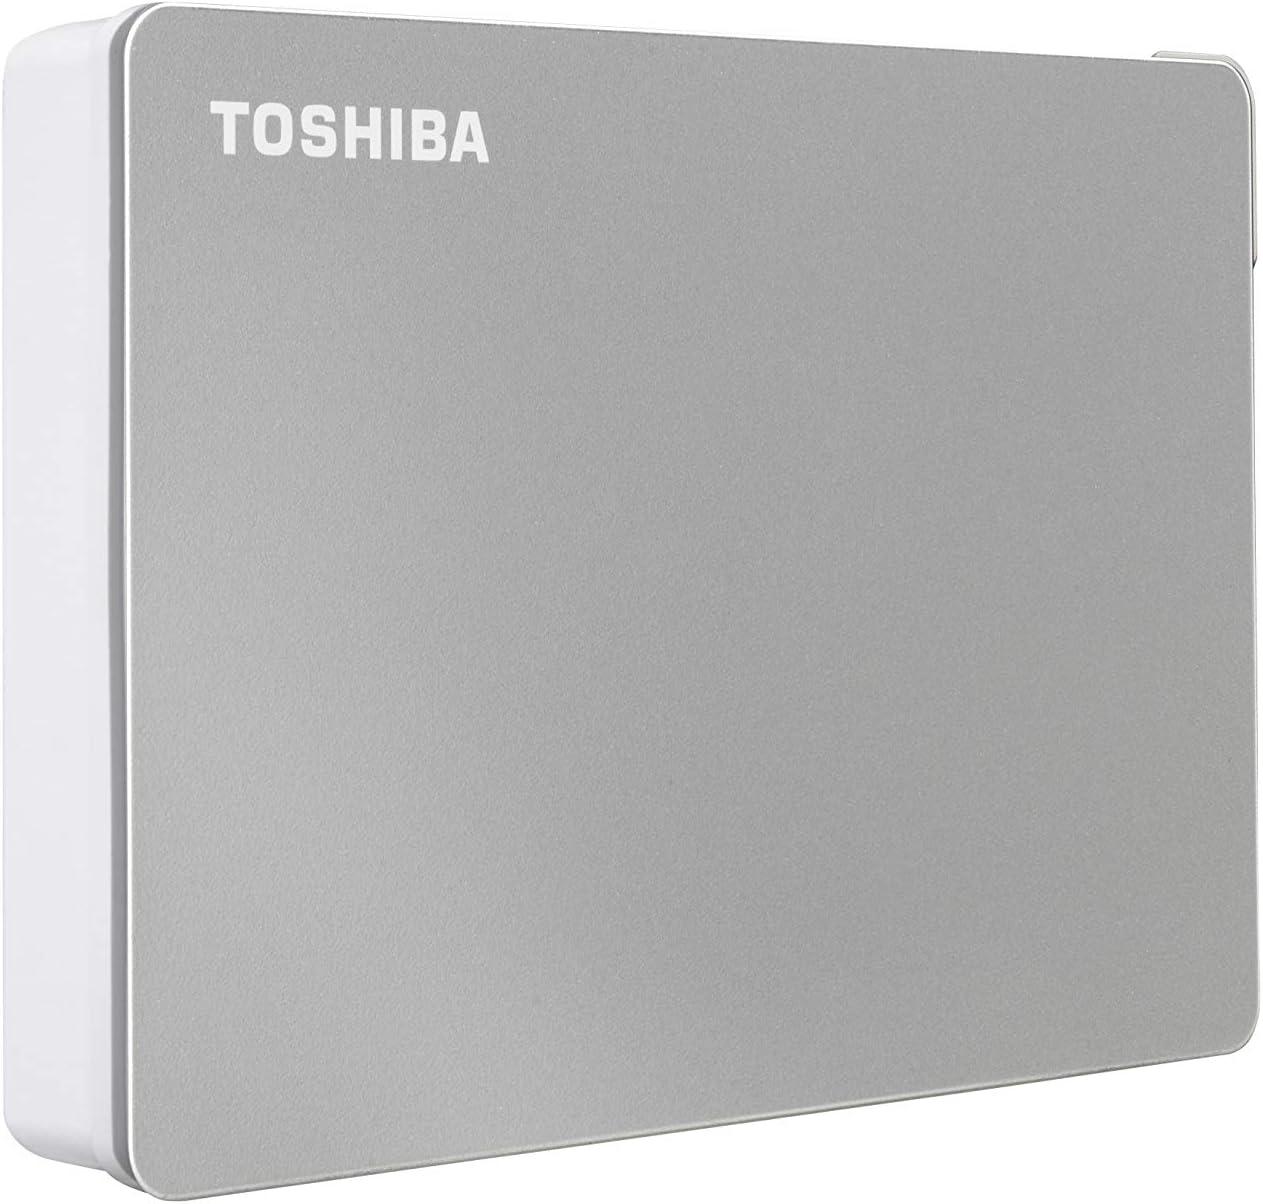 Toshiba Canvio Flex 4TB Portable External Hard Drive USB-C USB 3.0, Silver for PC, Mac, Tablet - HDTX140XSCCA